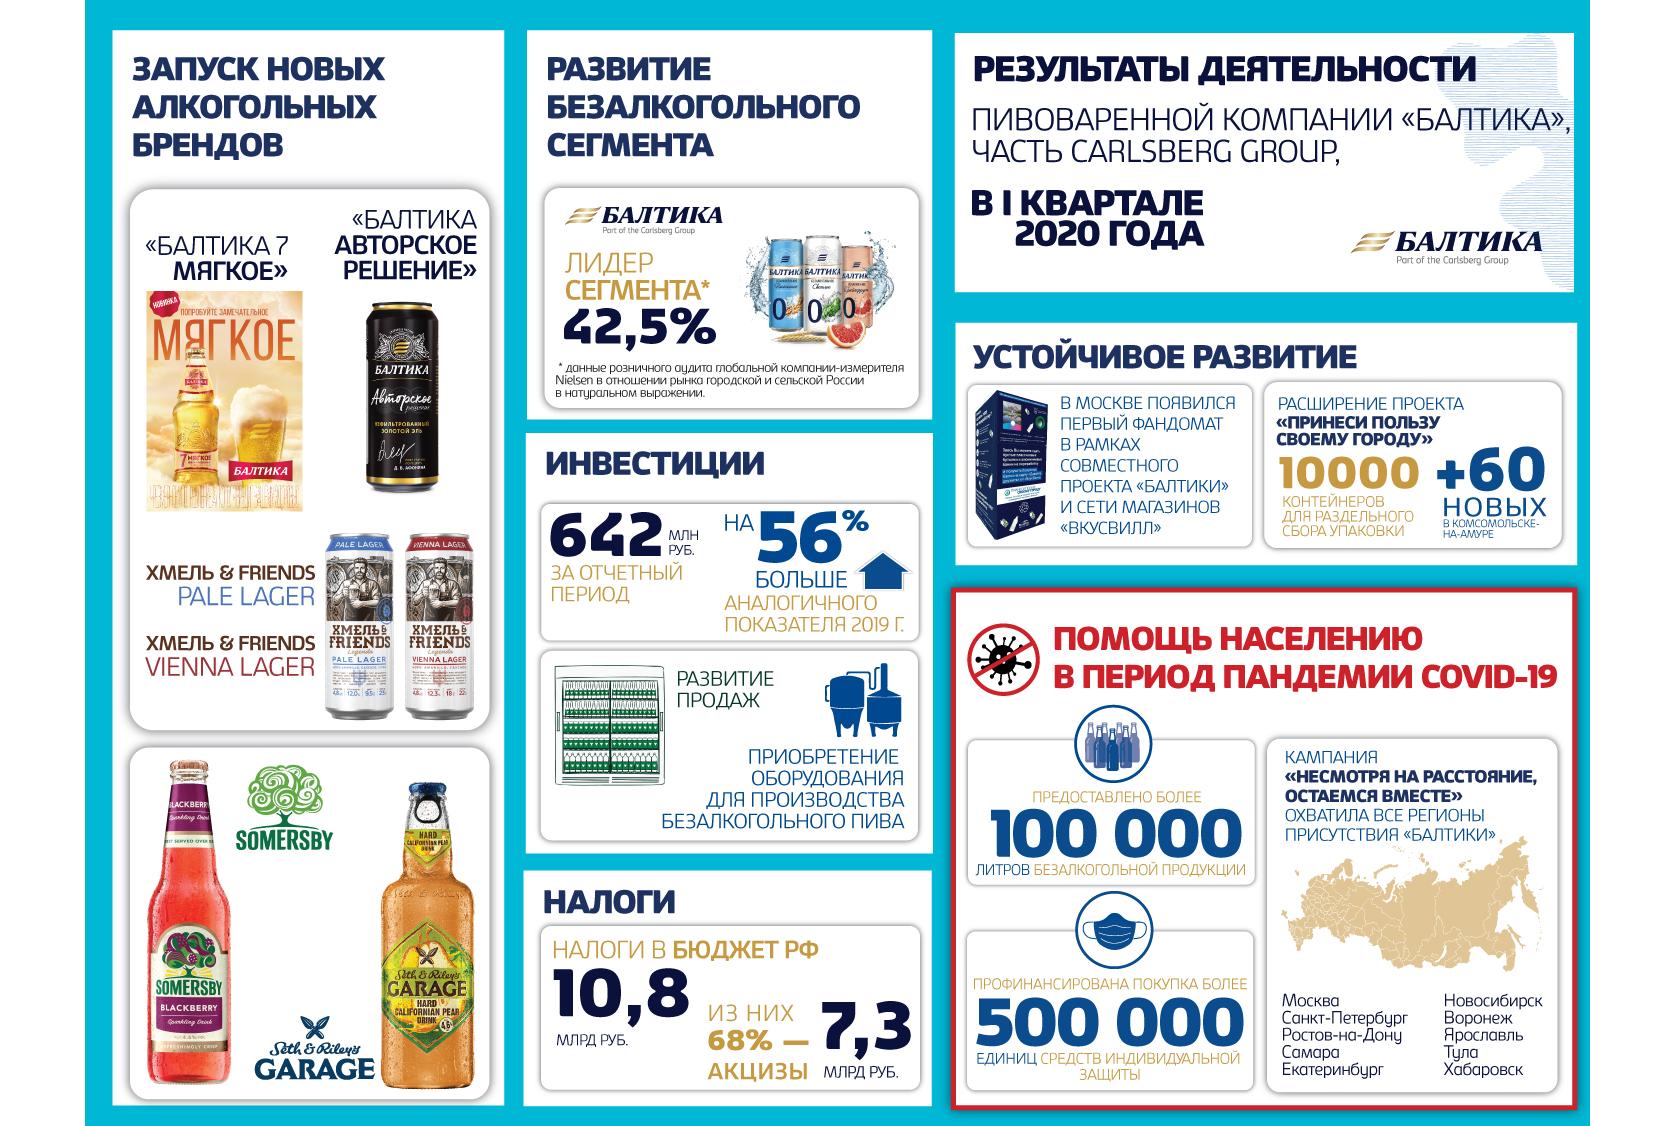 «Балтика» увеличила объем продаж в I квартале 2020 года